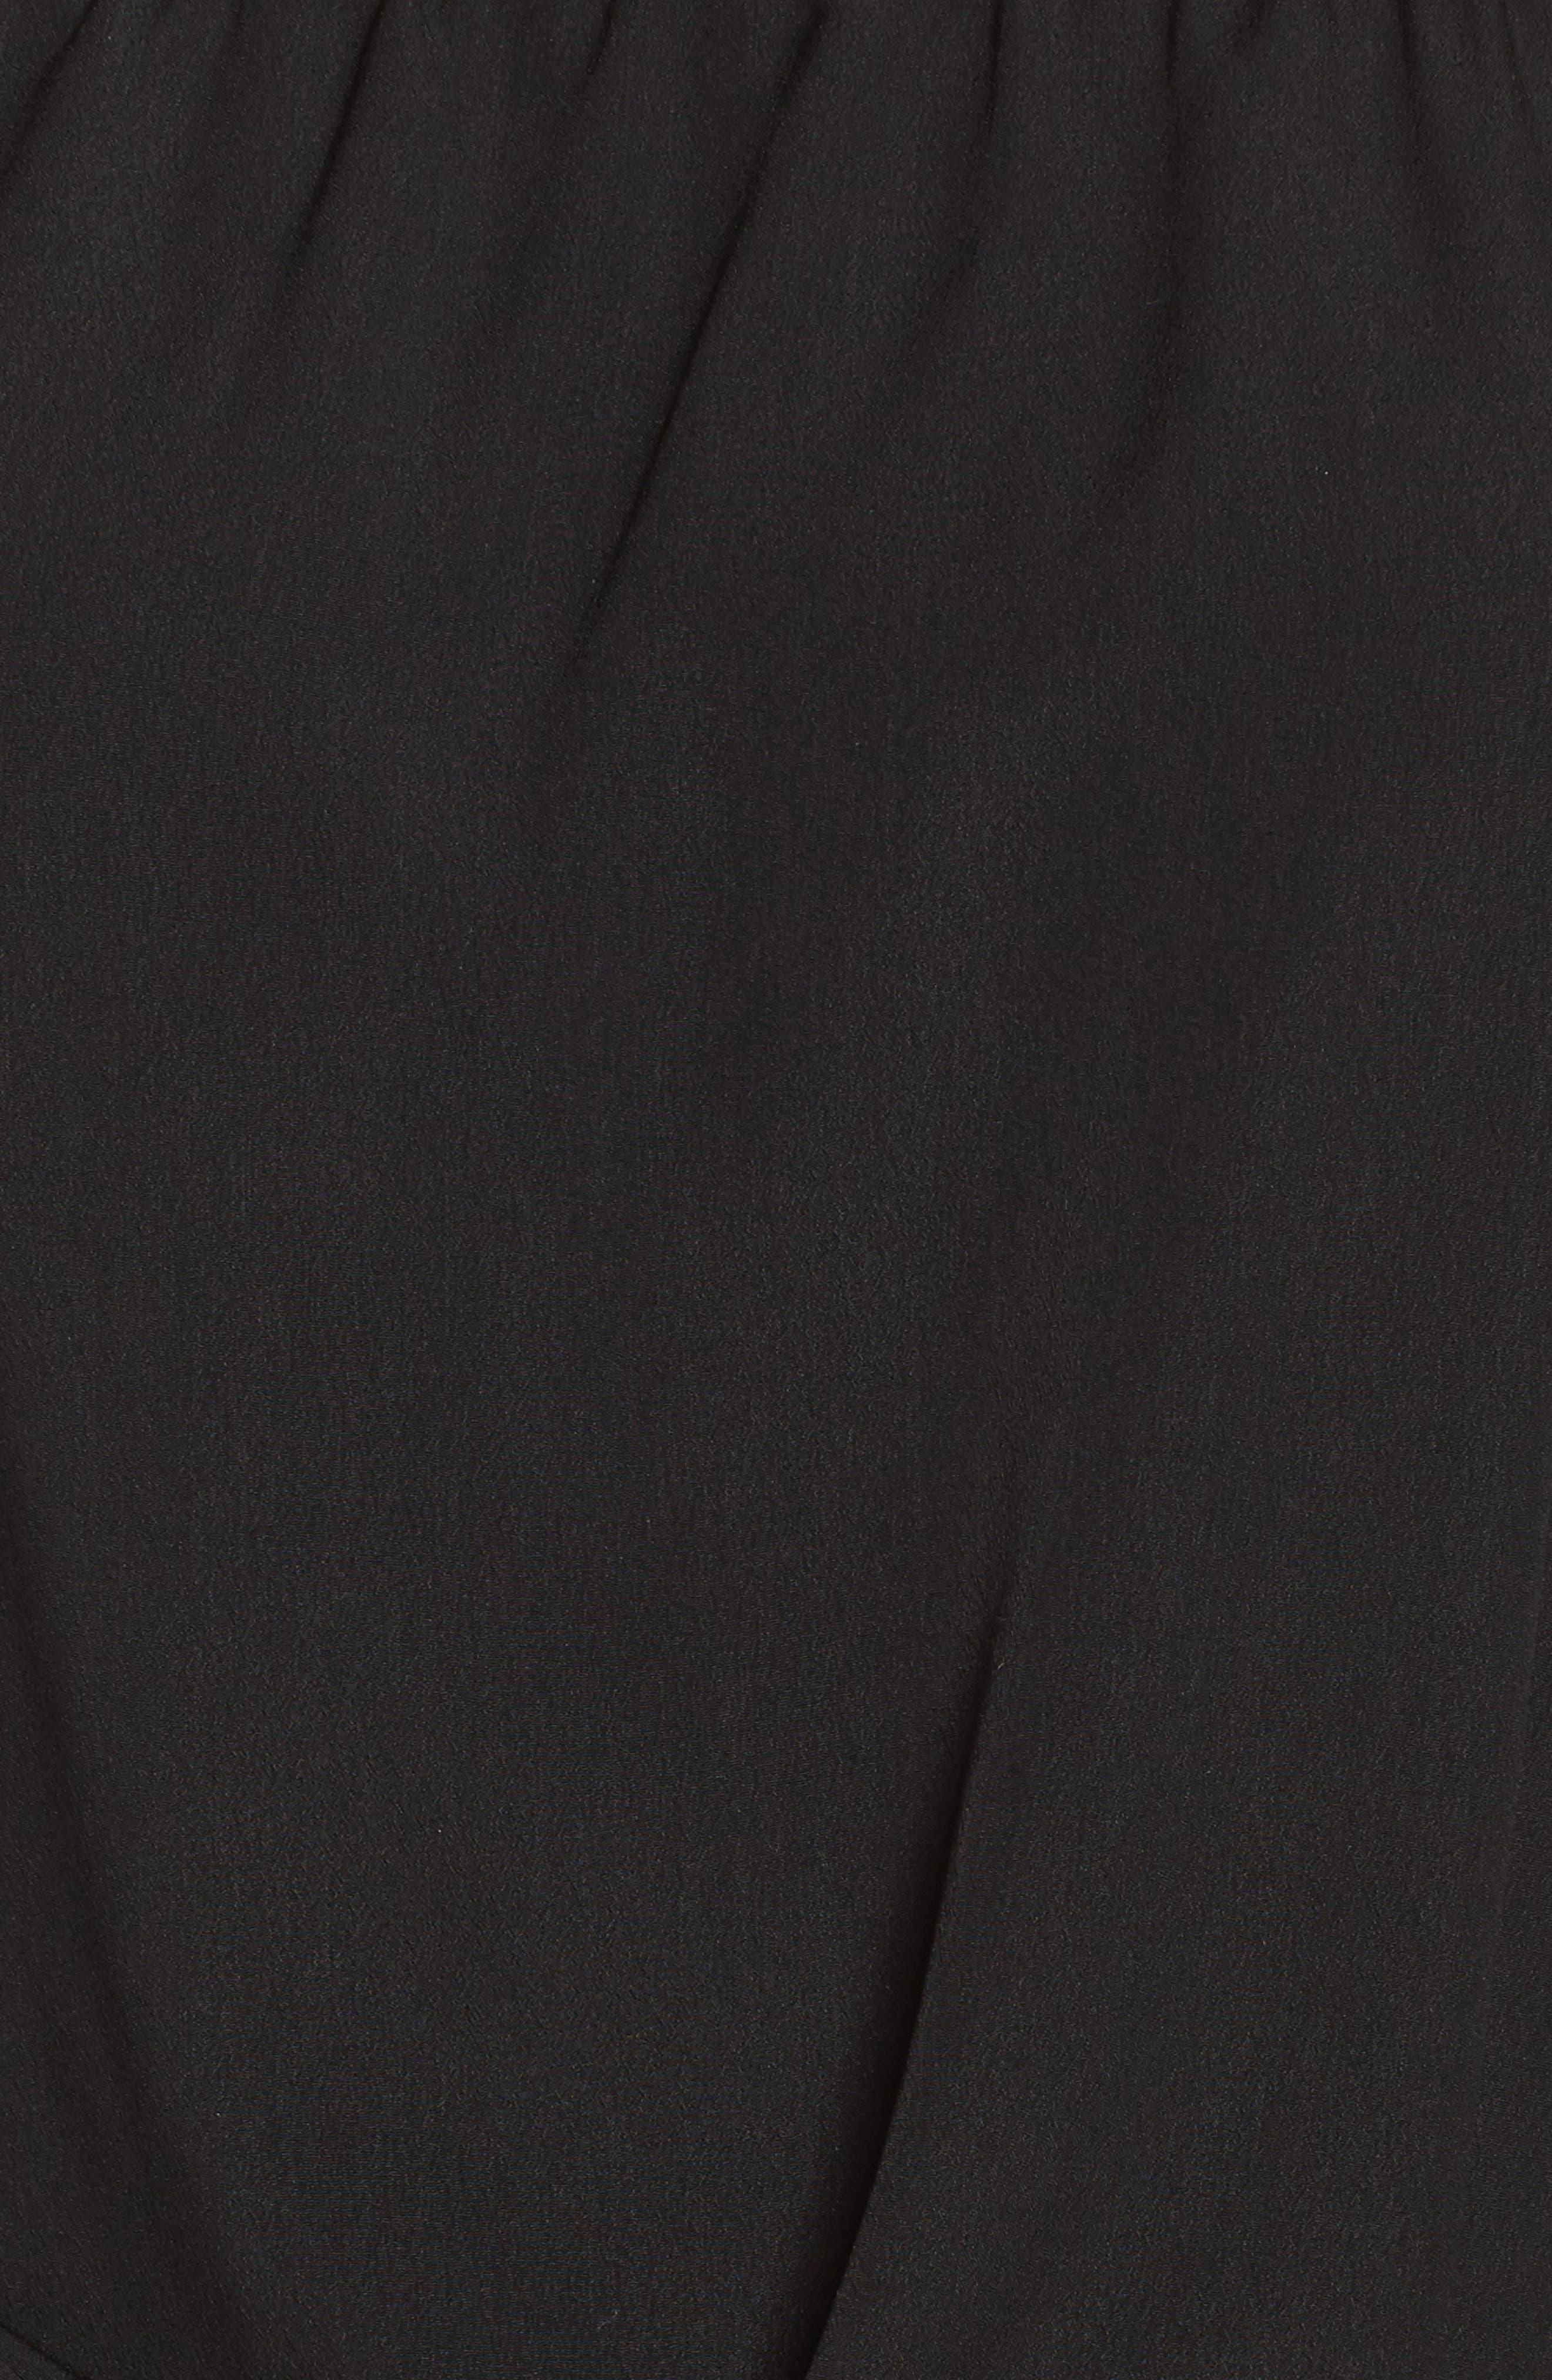 Off the Shoulder Tiered Sleeve Dress,                             Alternate thumbnail 5, color,                             Black